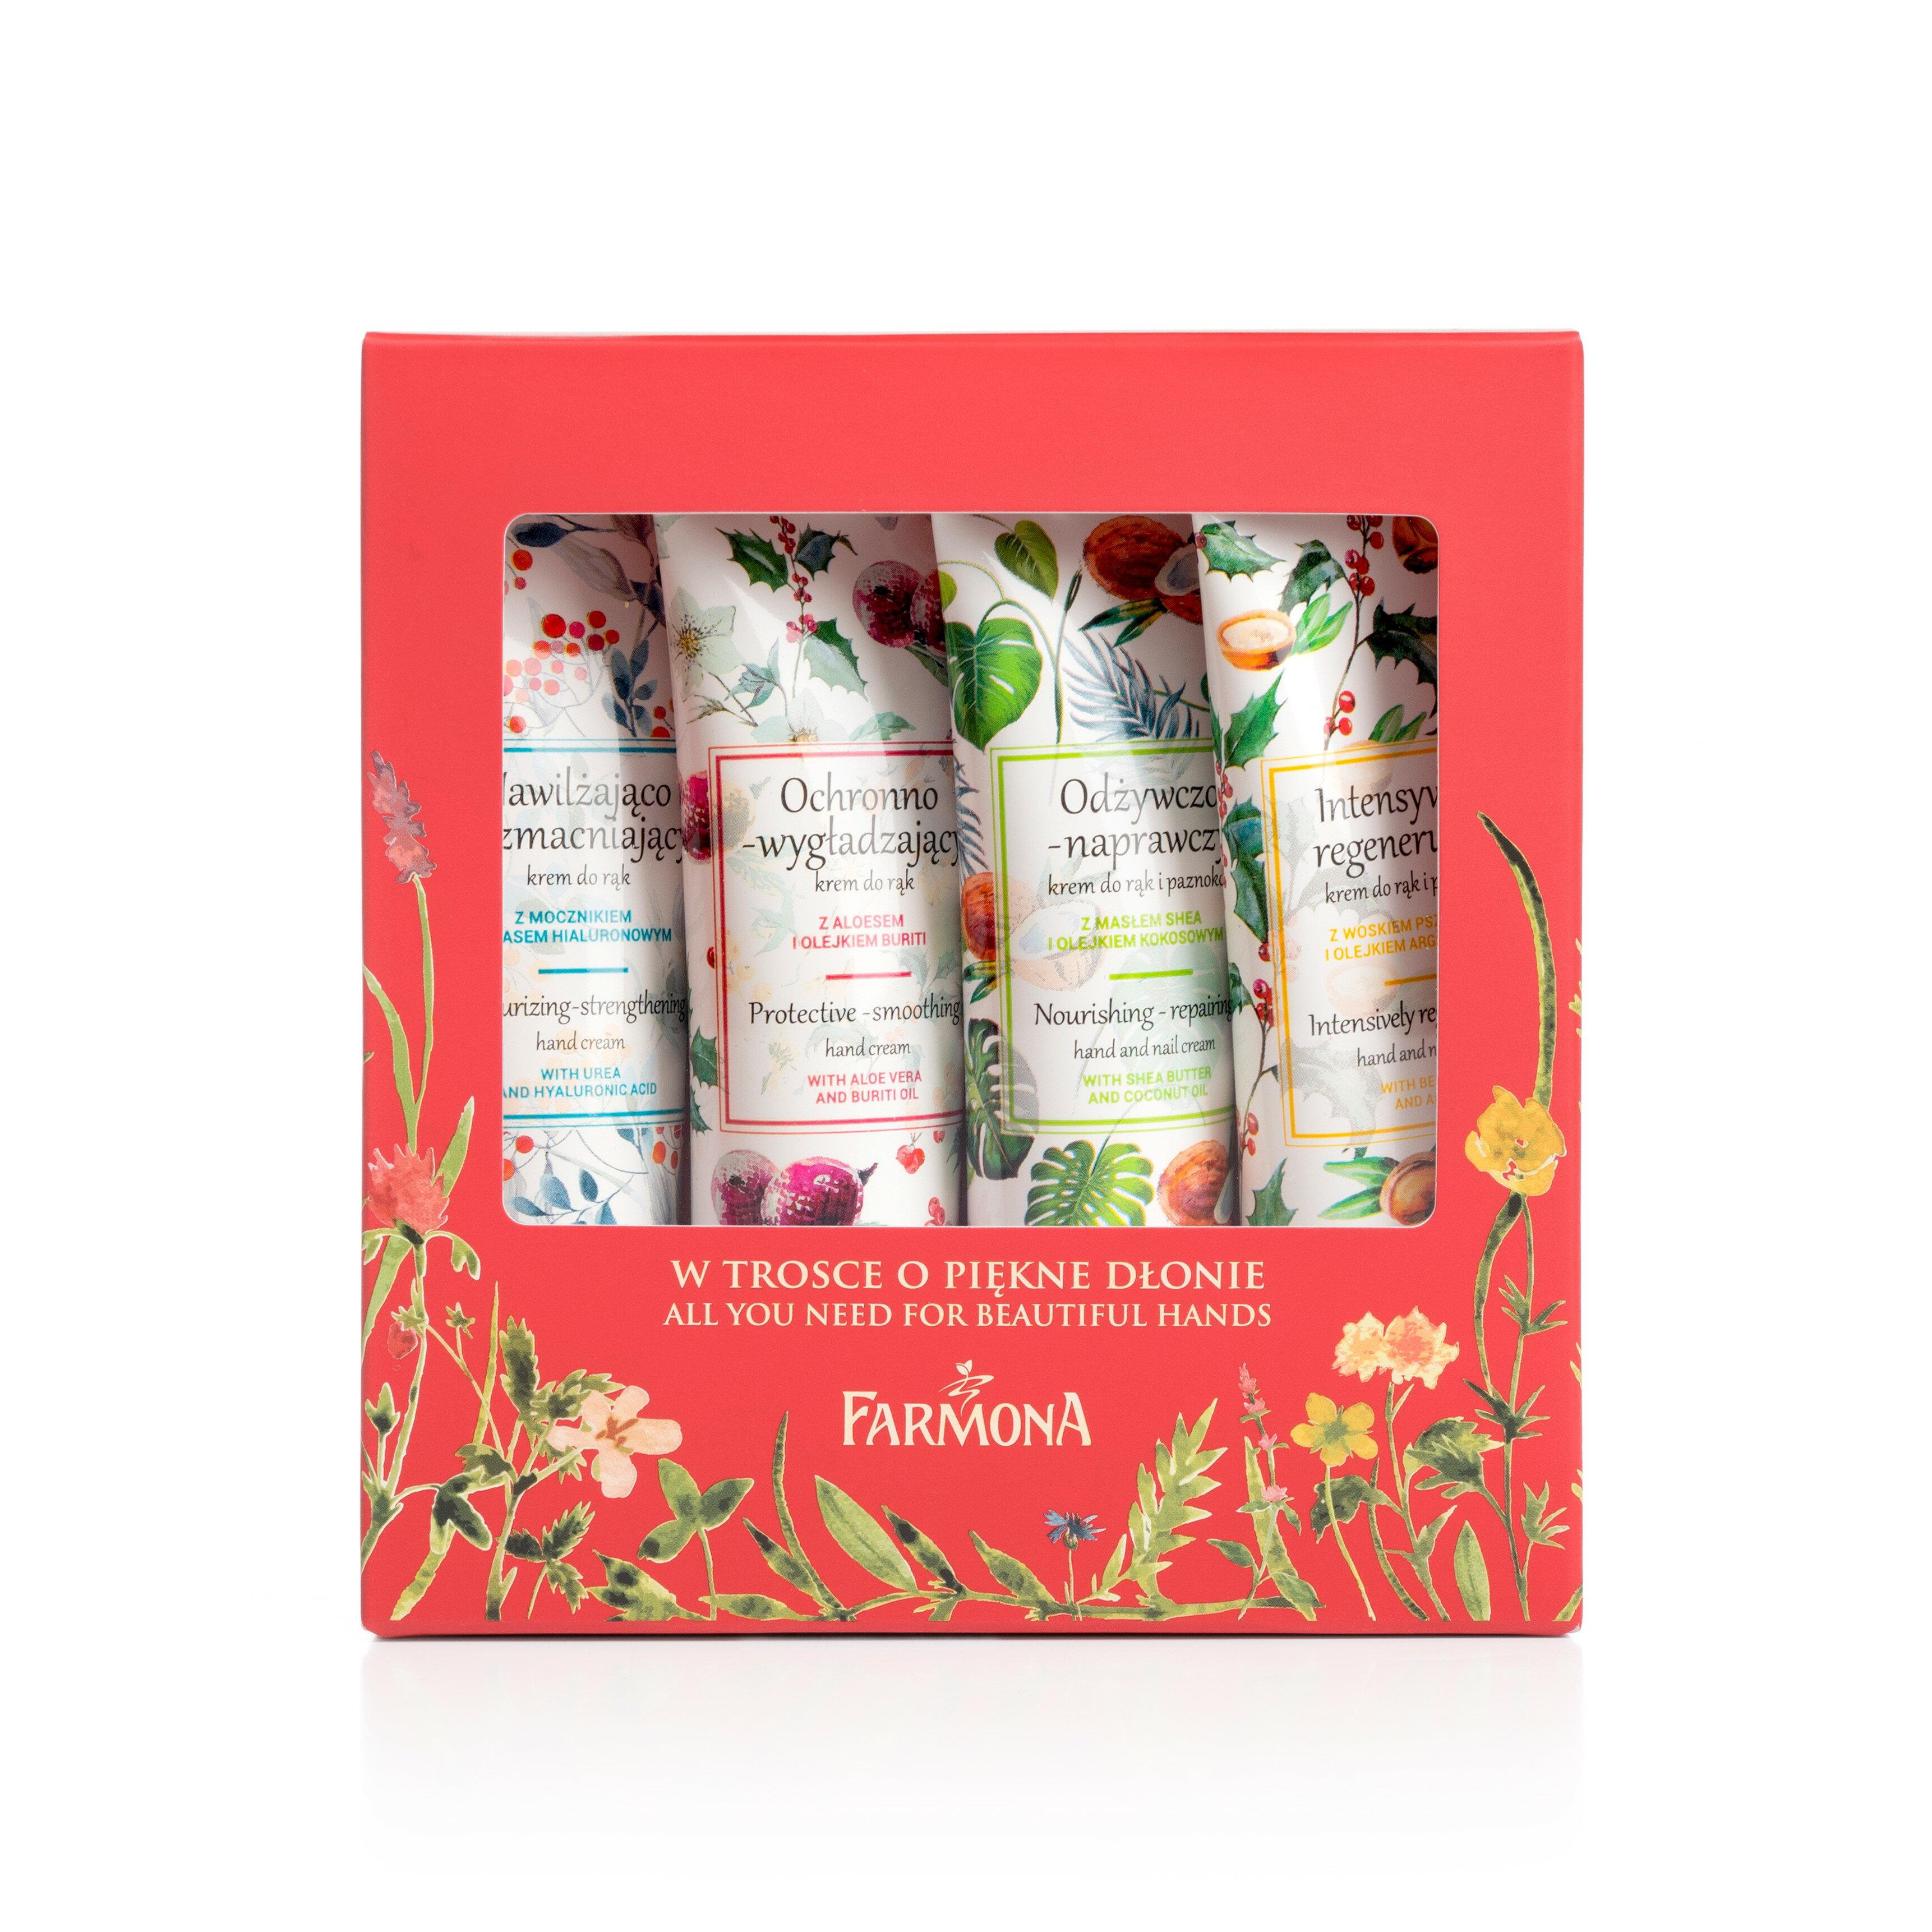 FARMONA 經典聖誕香氛護手禮盒組(4入) /送禮自用兩相宜